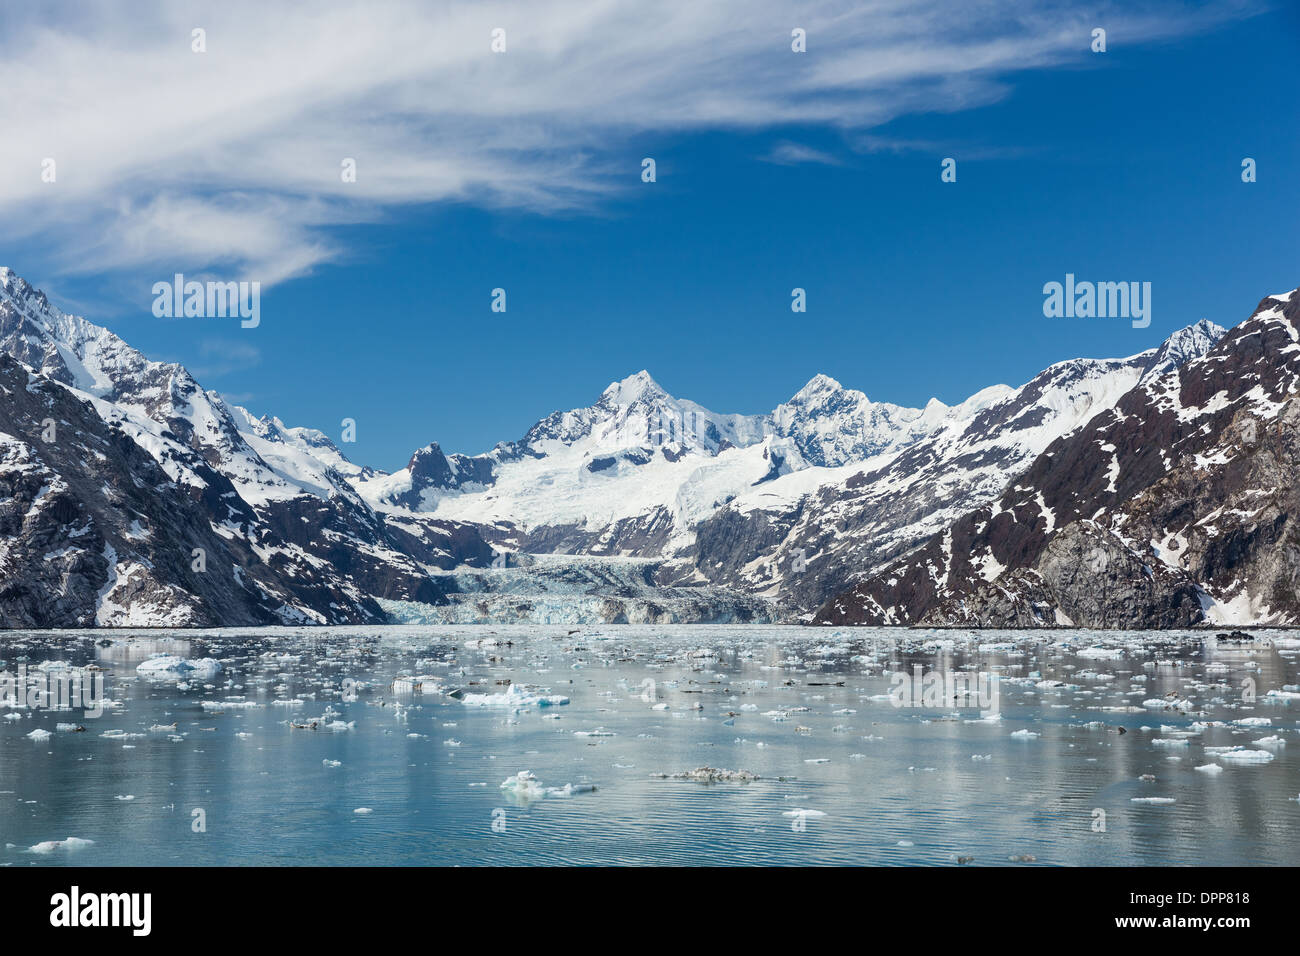 Johns Hopkins Inlet, Glacier Bay, Alaska. - Stock Image